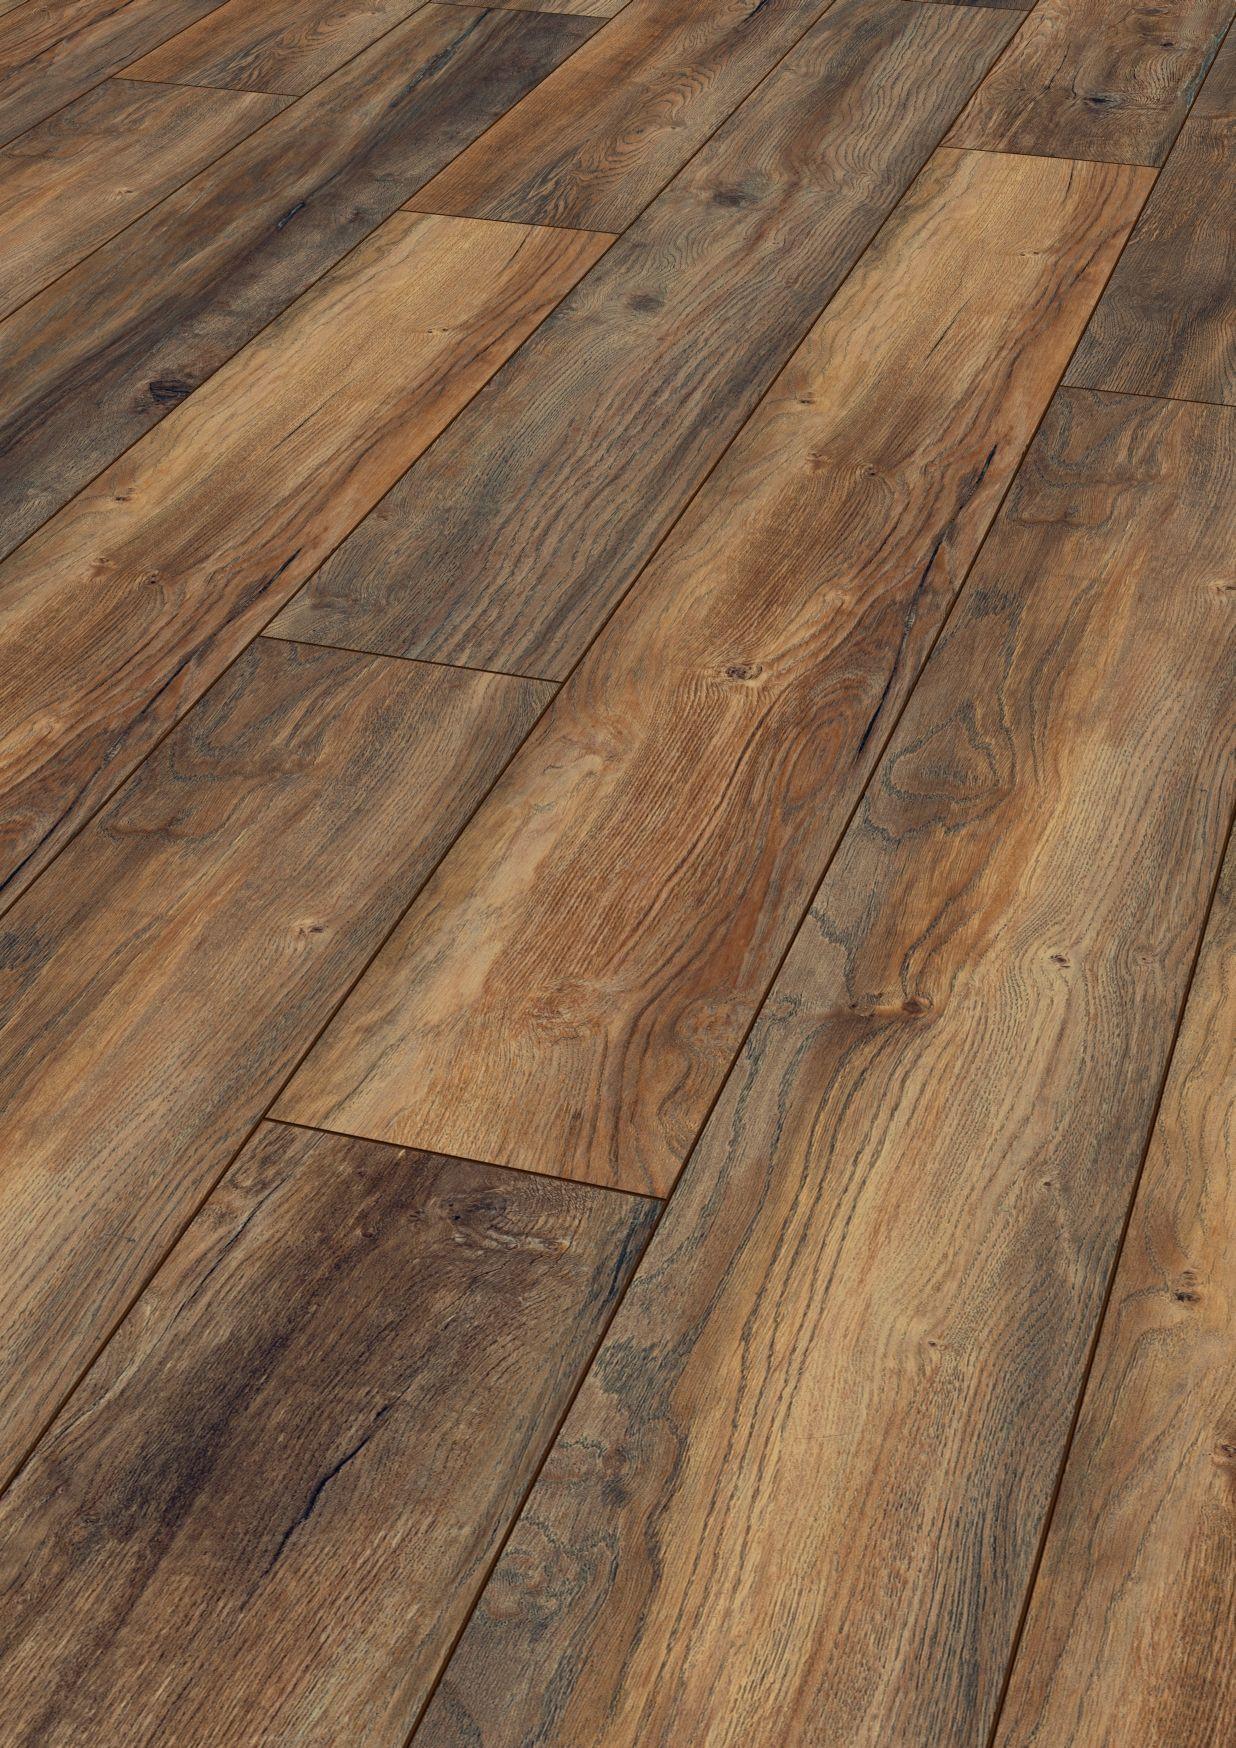 types of hardwood floor finishes of kronotex amazon harbour oak amazon house and flooring ideas intended for kronotex amazon harbour oak aa floors toronto